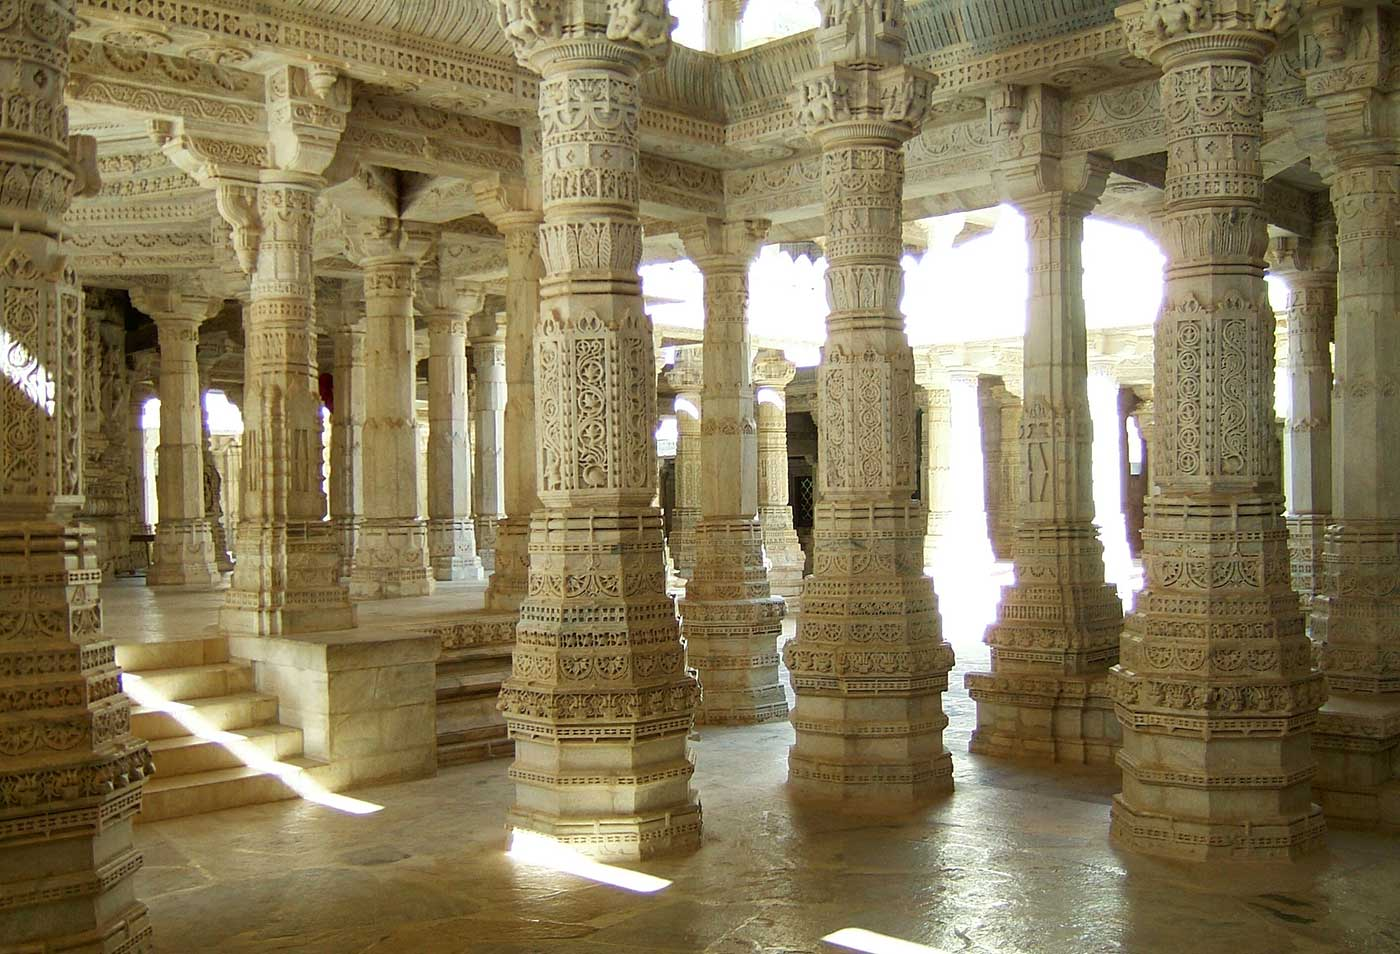 Jain Marble Temple pillar Frescoes, Ranakpur, Pali district, India